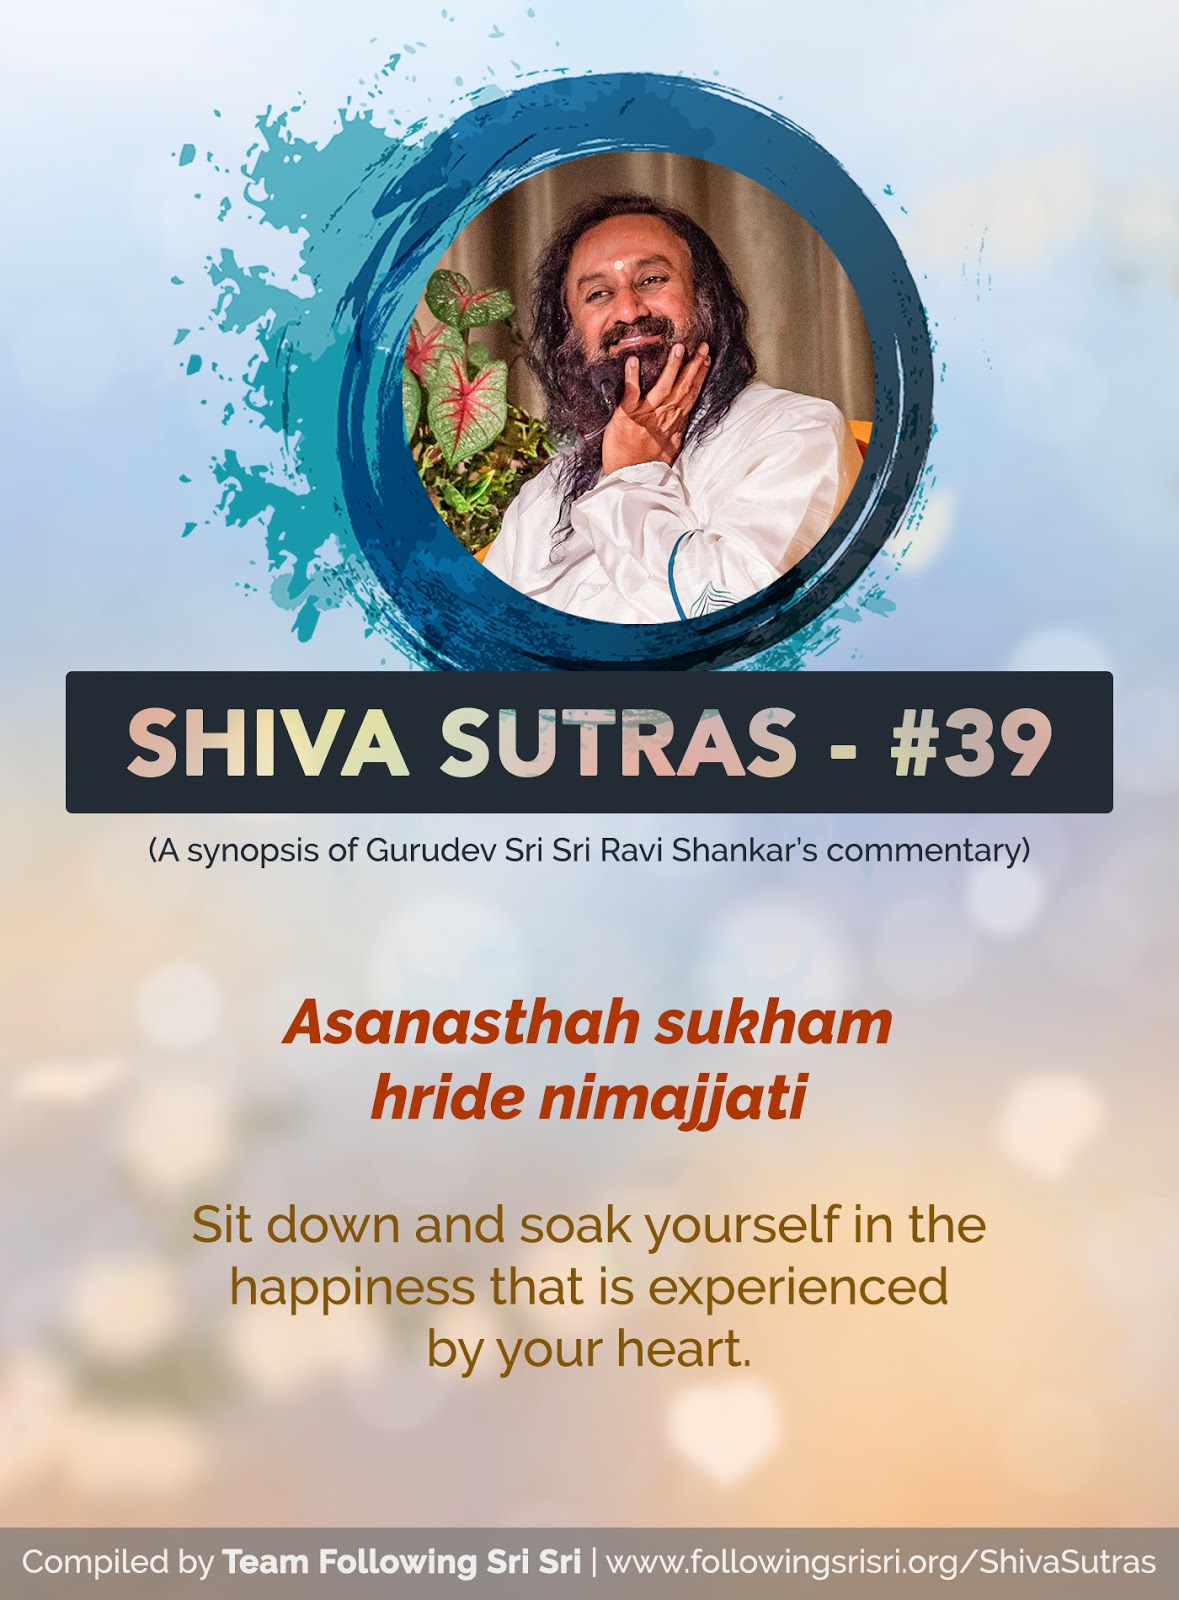 Shiva Sutras - Sutra 39